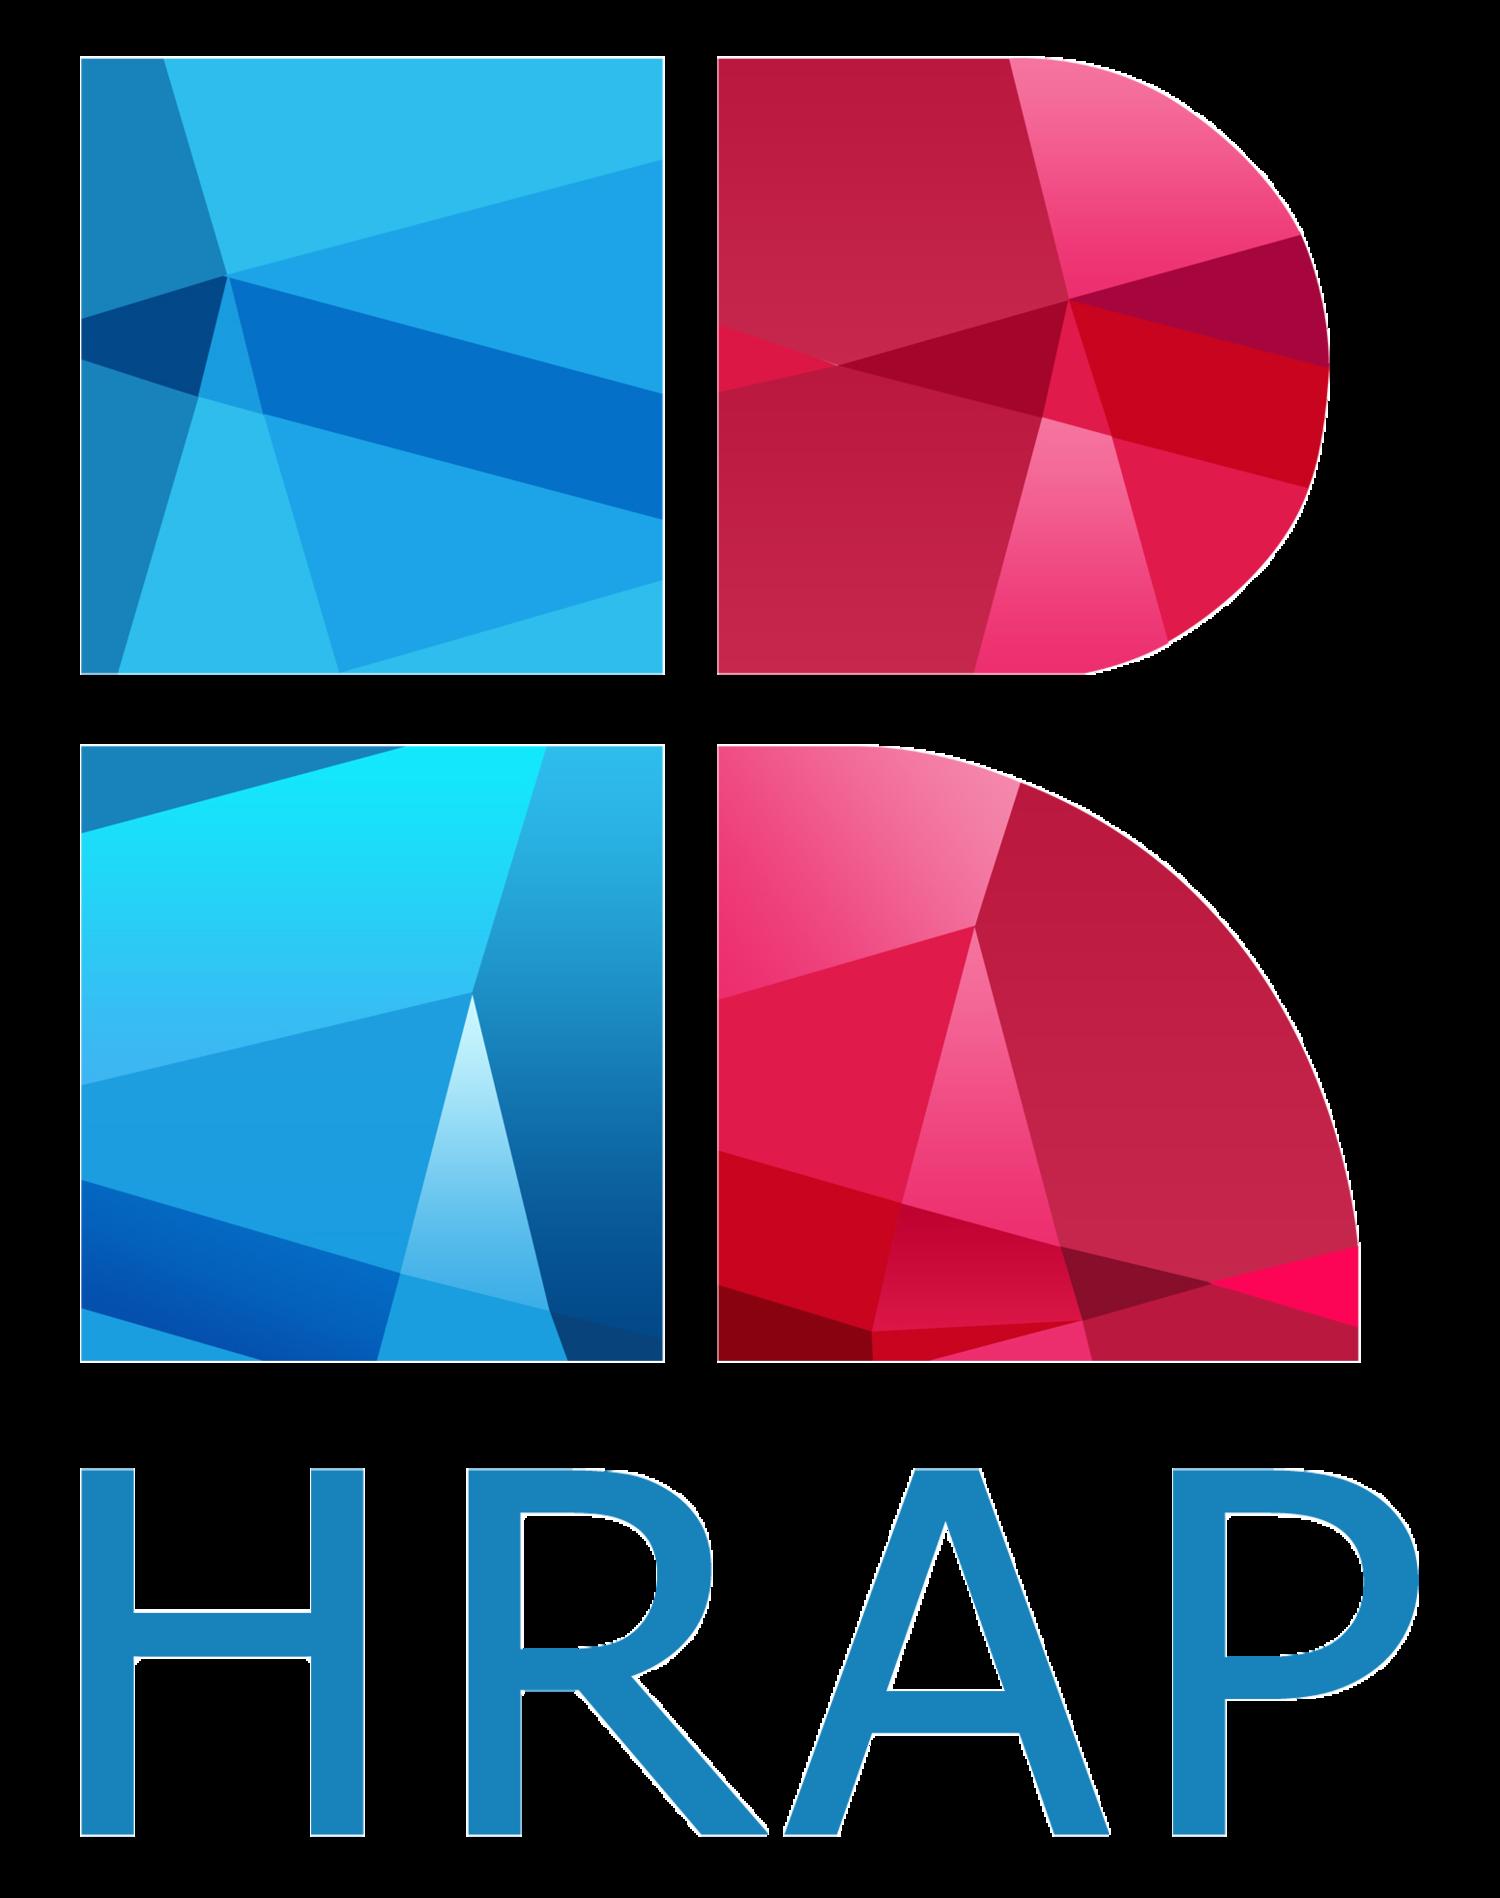 Hotel & Restaurant Association of the Philippines